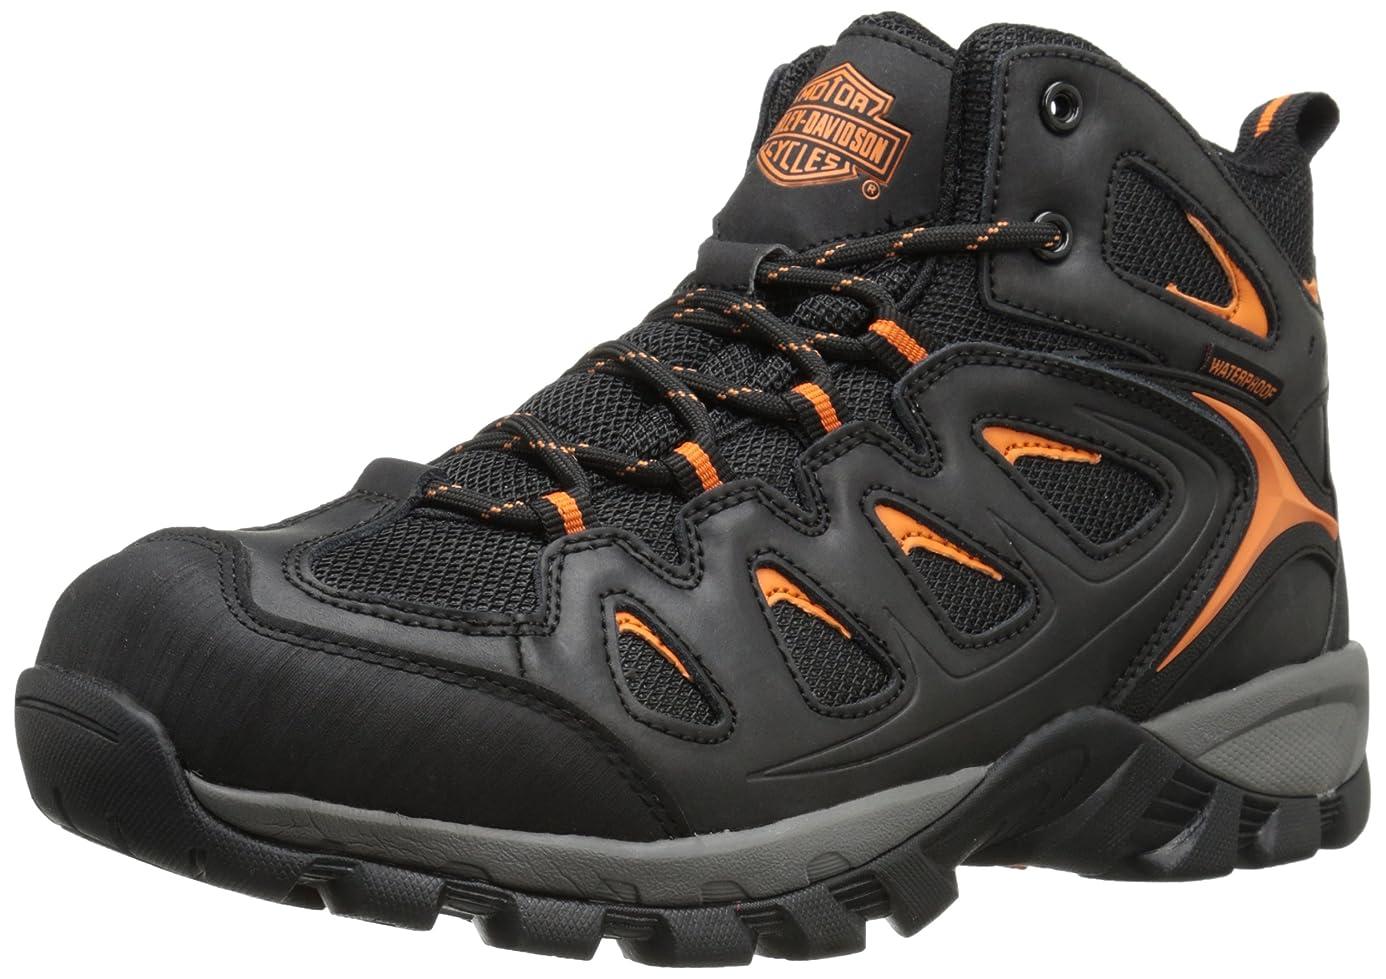 Harley-Davidson Men's Woodridge Waterproof Hiker lhw8832073